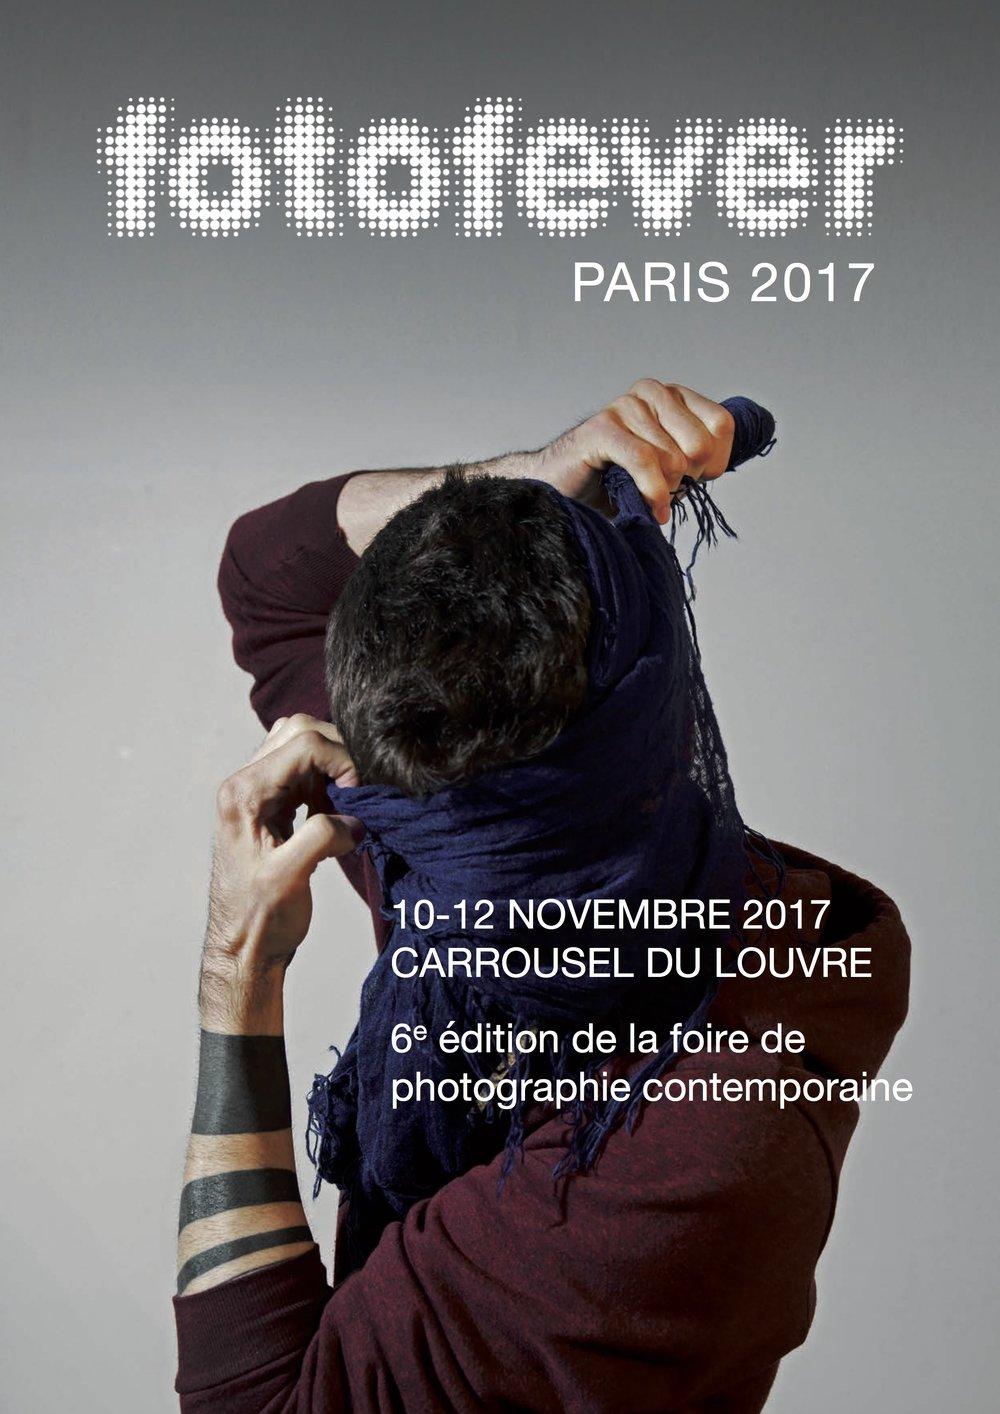 DP_foire fotofever paris 2018.jpg